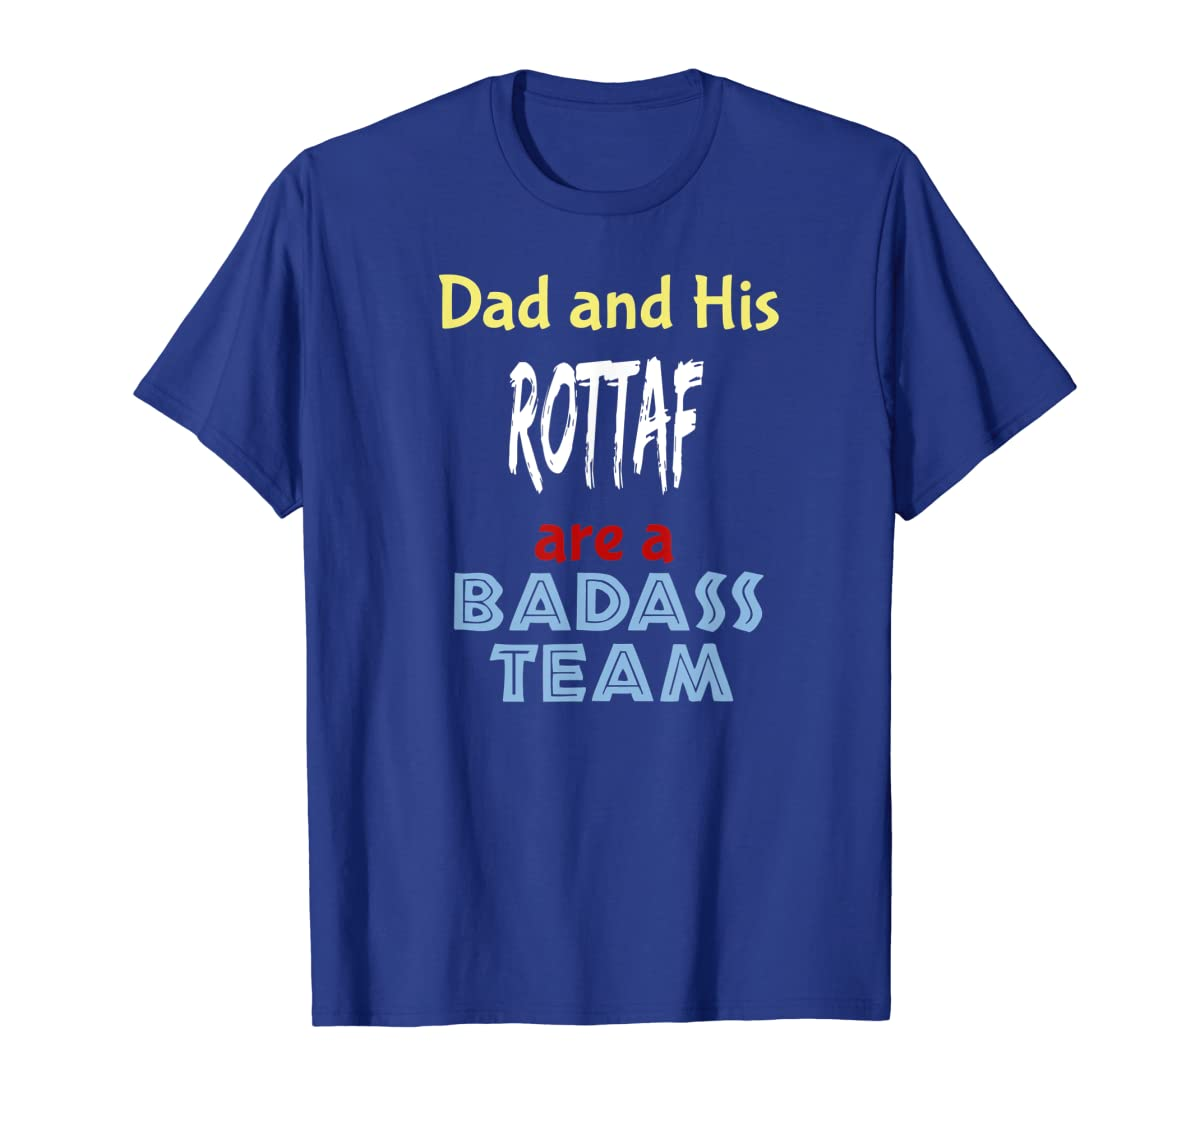 Mens Rottaf Dog Shirt Love Rottweiler + Afghan Hound = T-Shirt-Men's T-Shirt-Royal